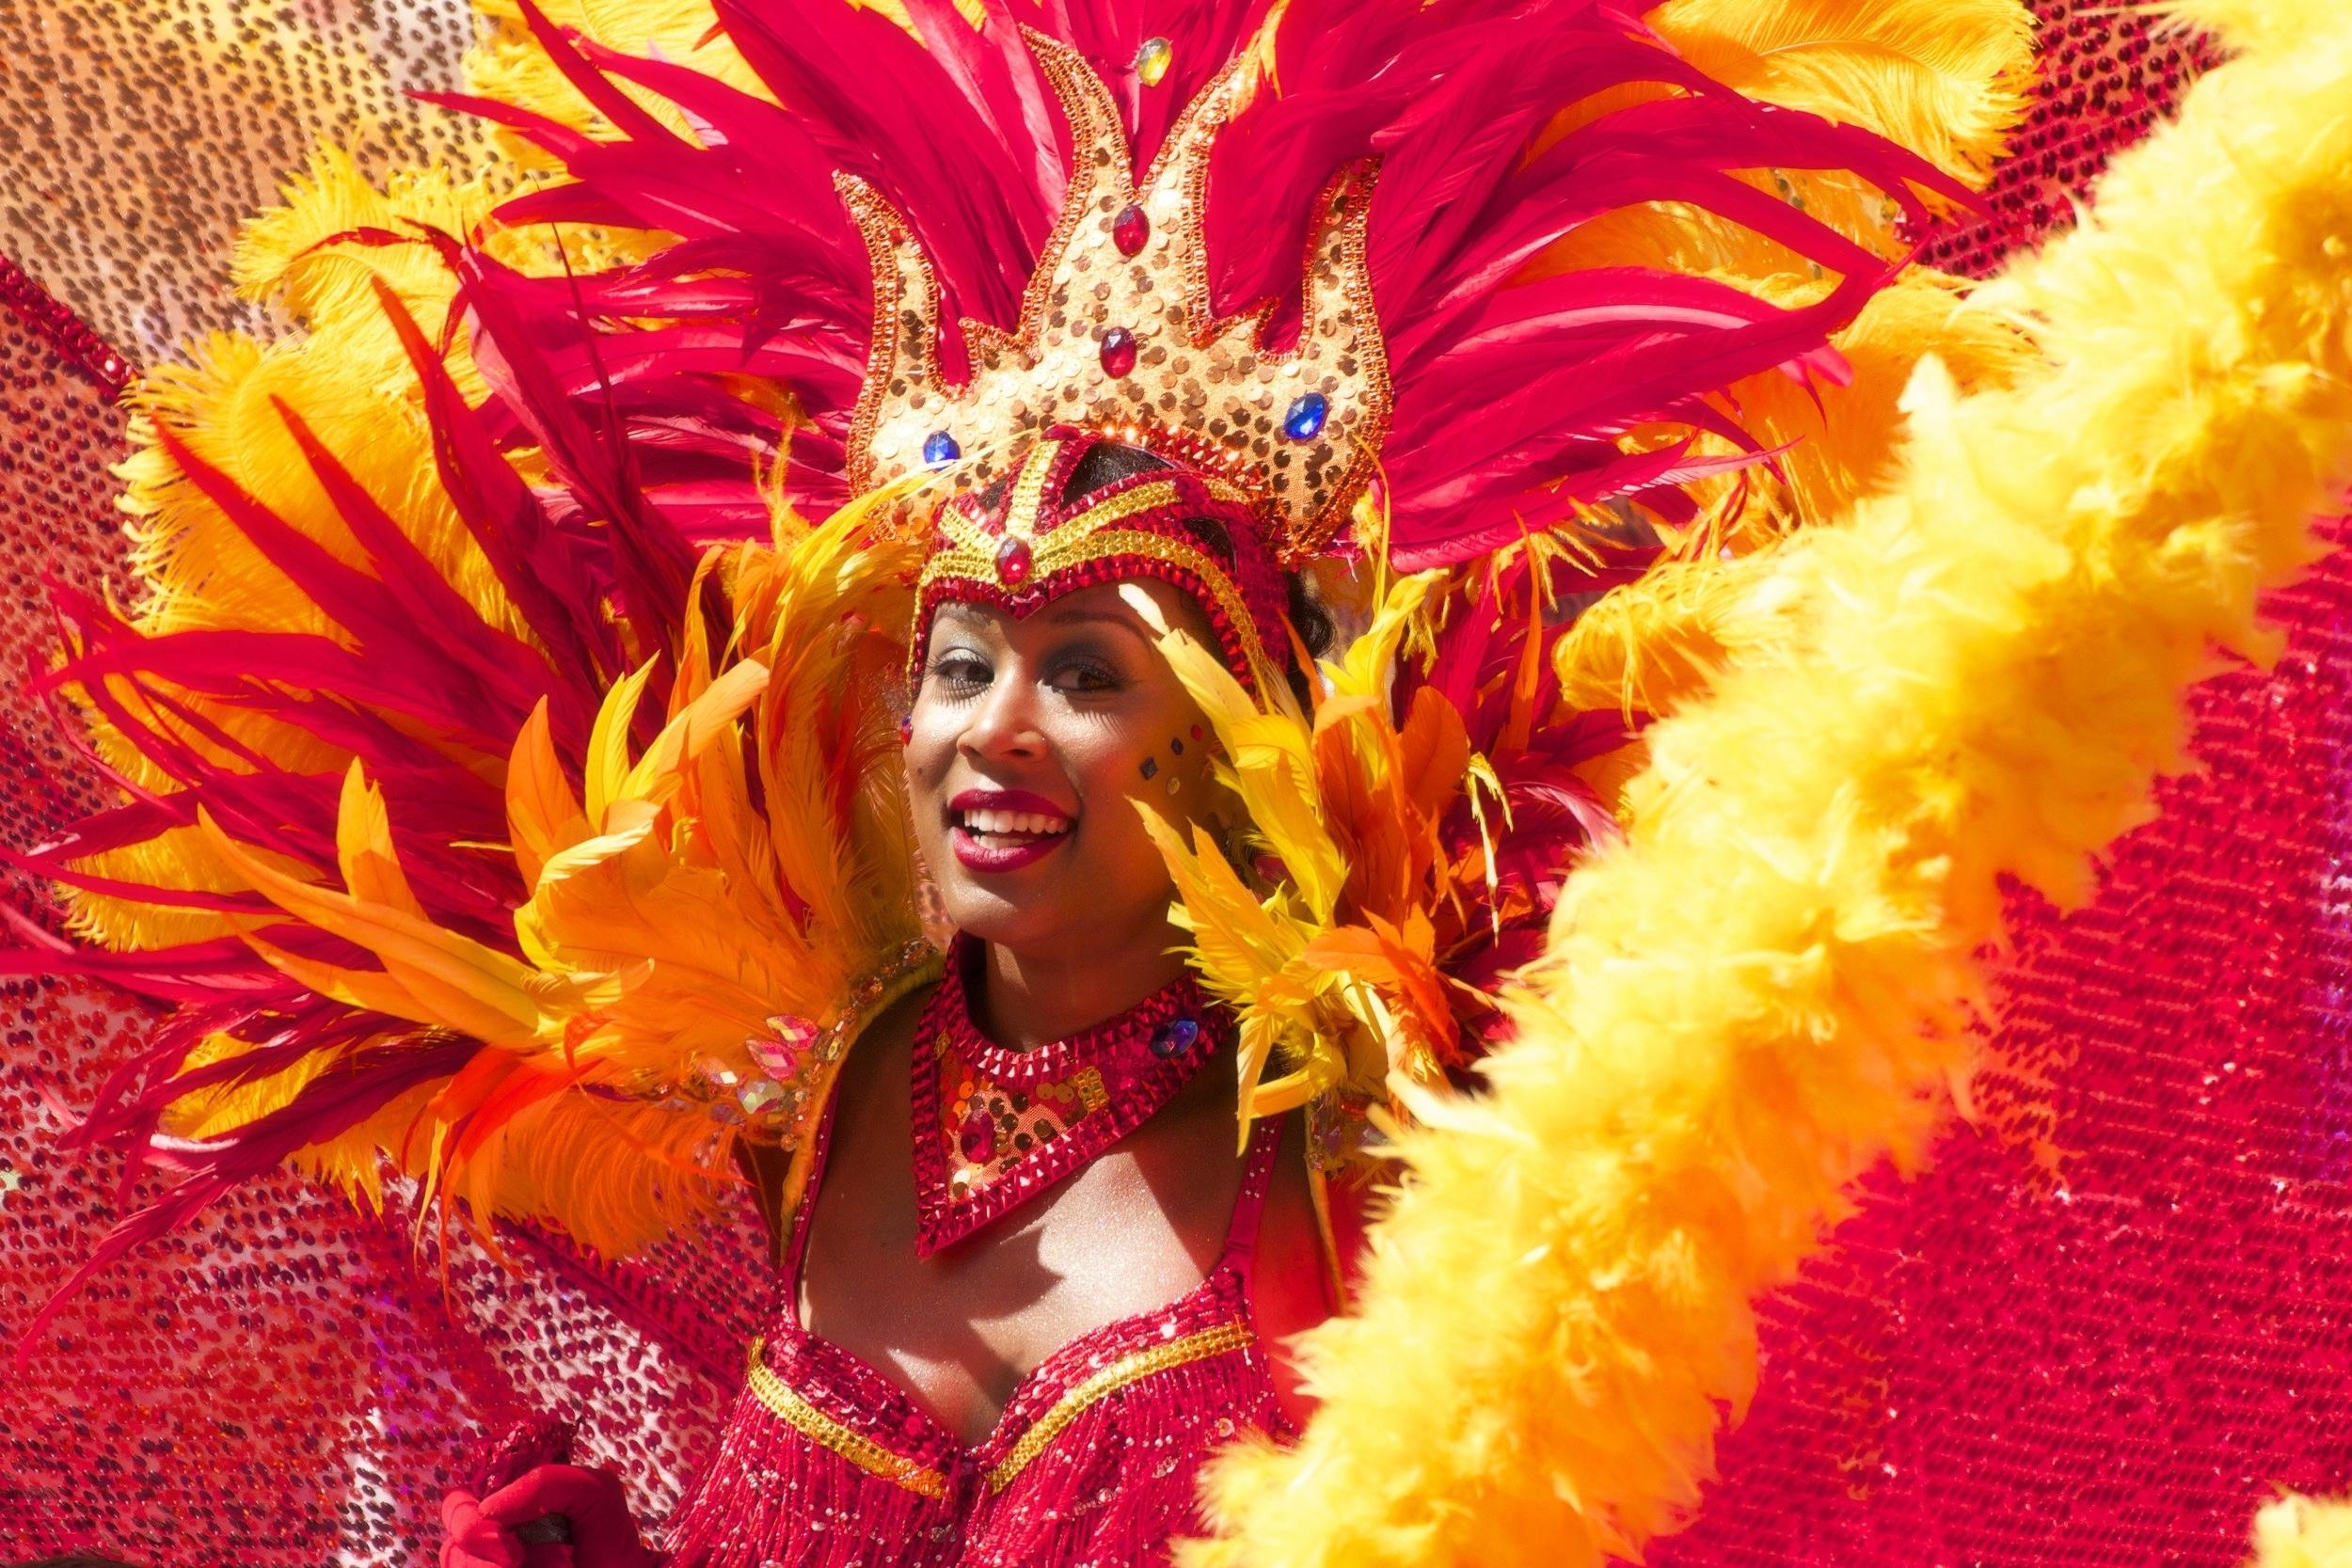 carnival photo_pexel_brazil-cariwest-carnival-48796.jpg